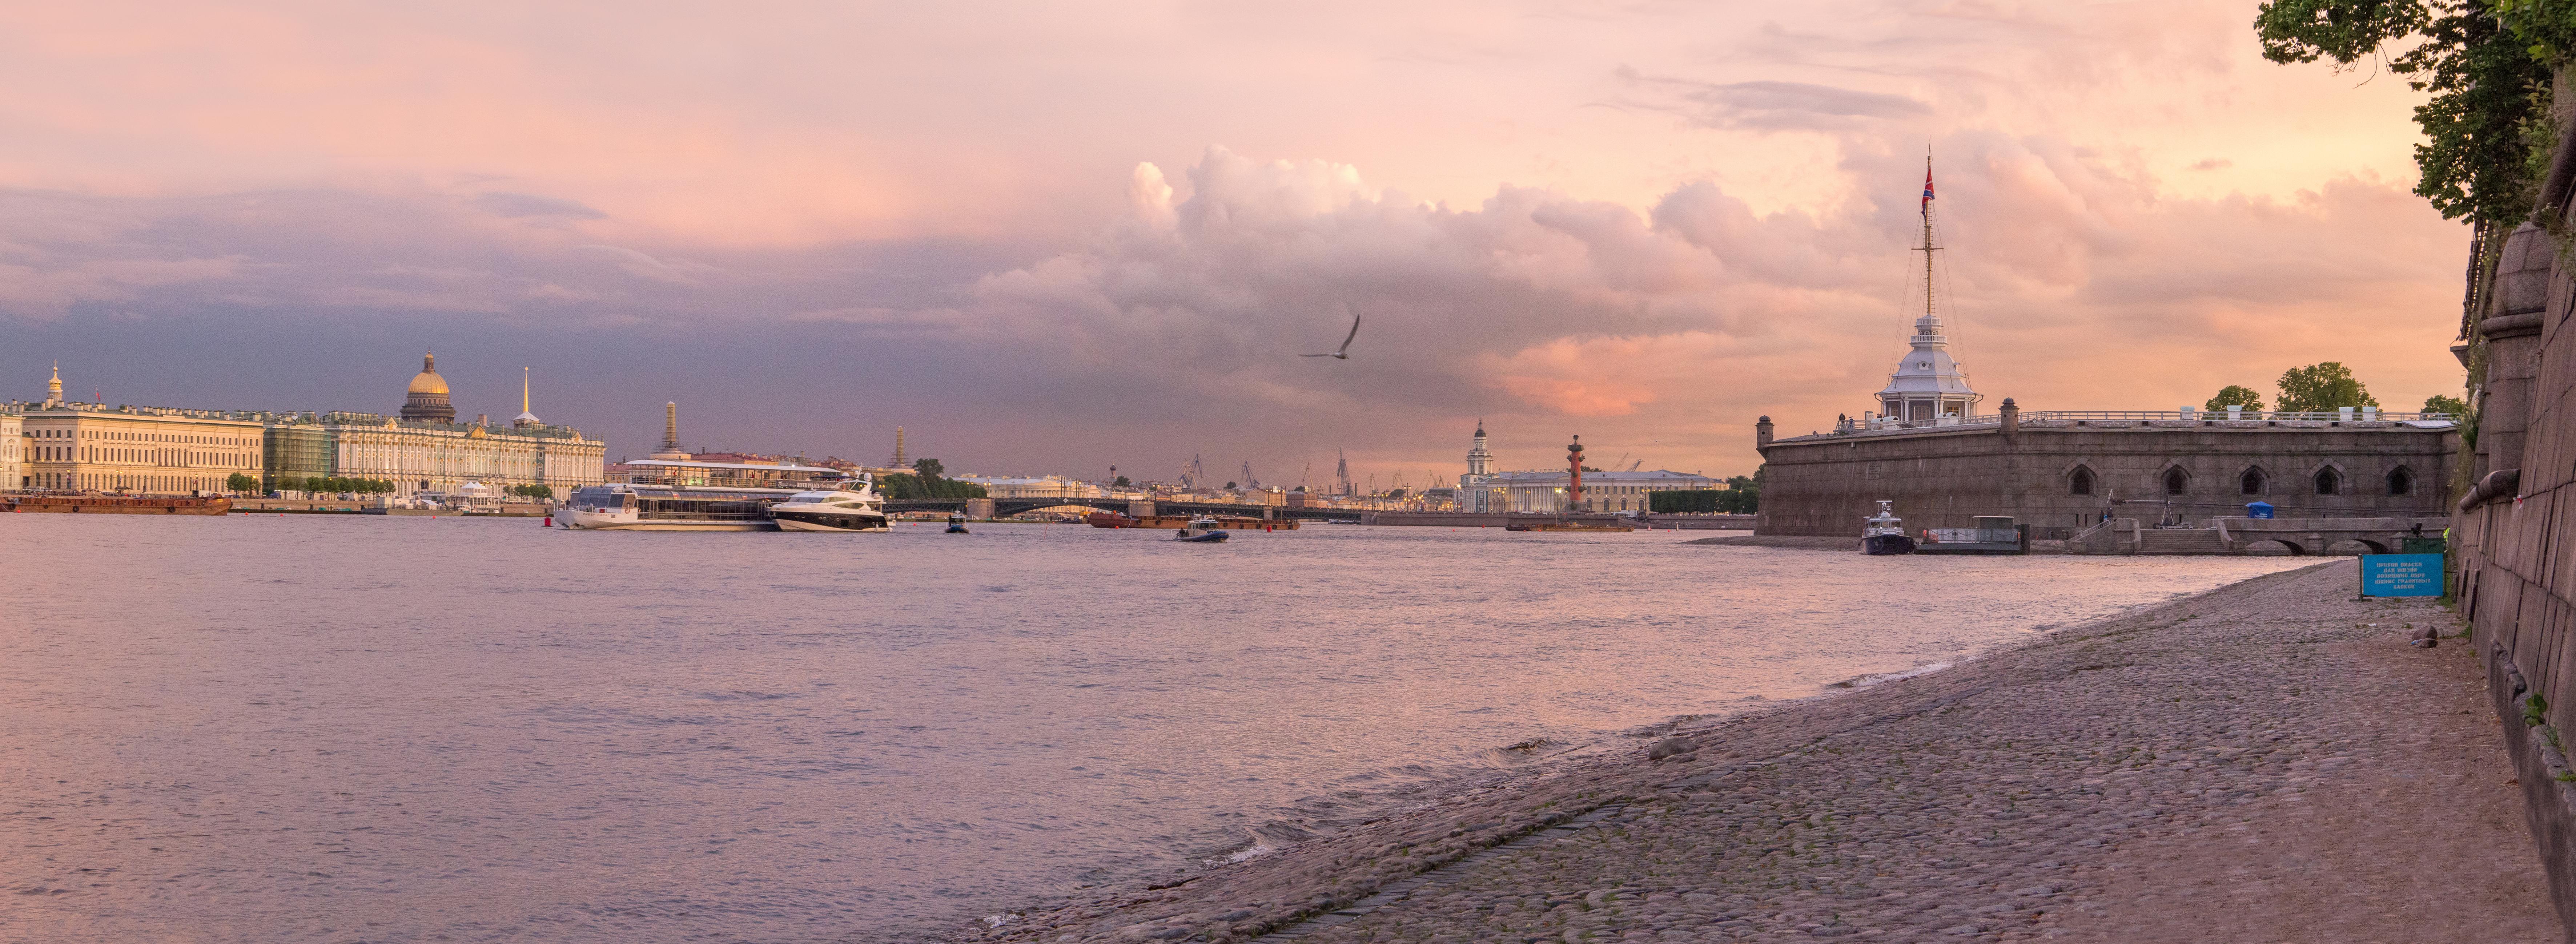 Богемный Петербург